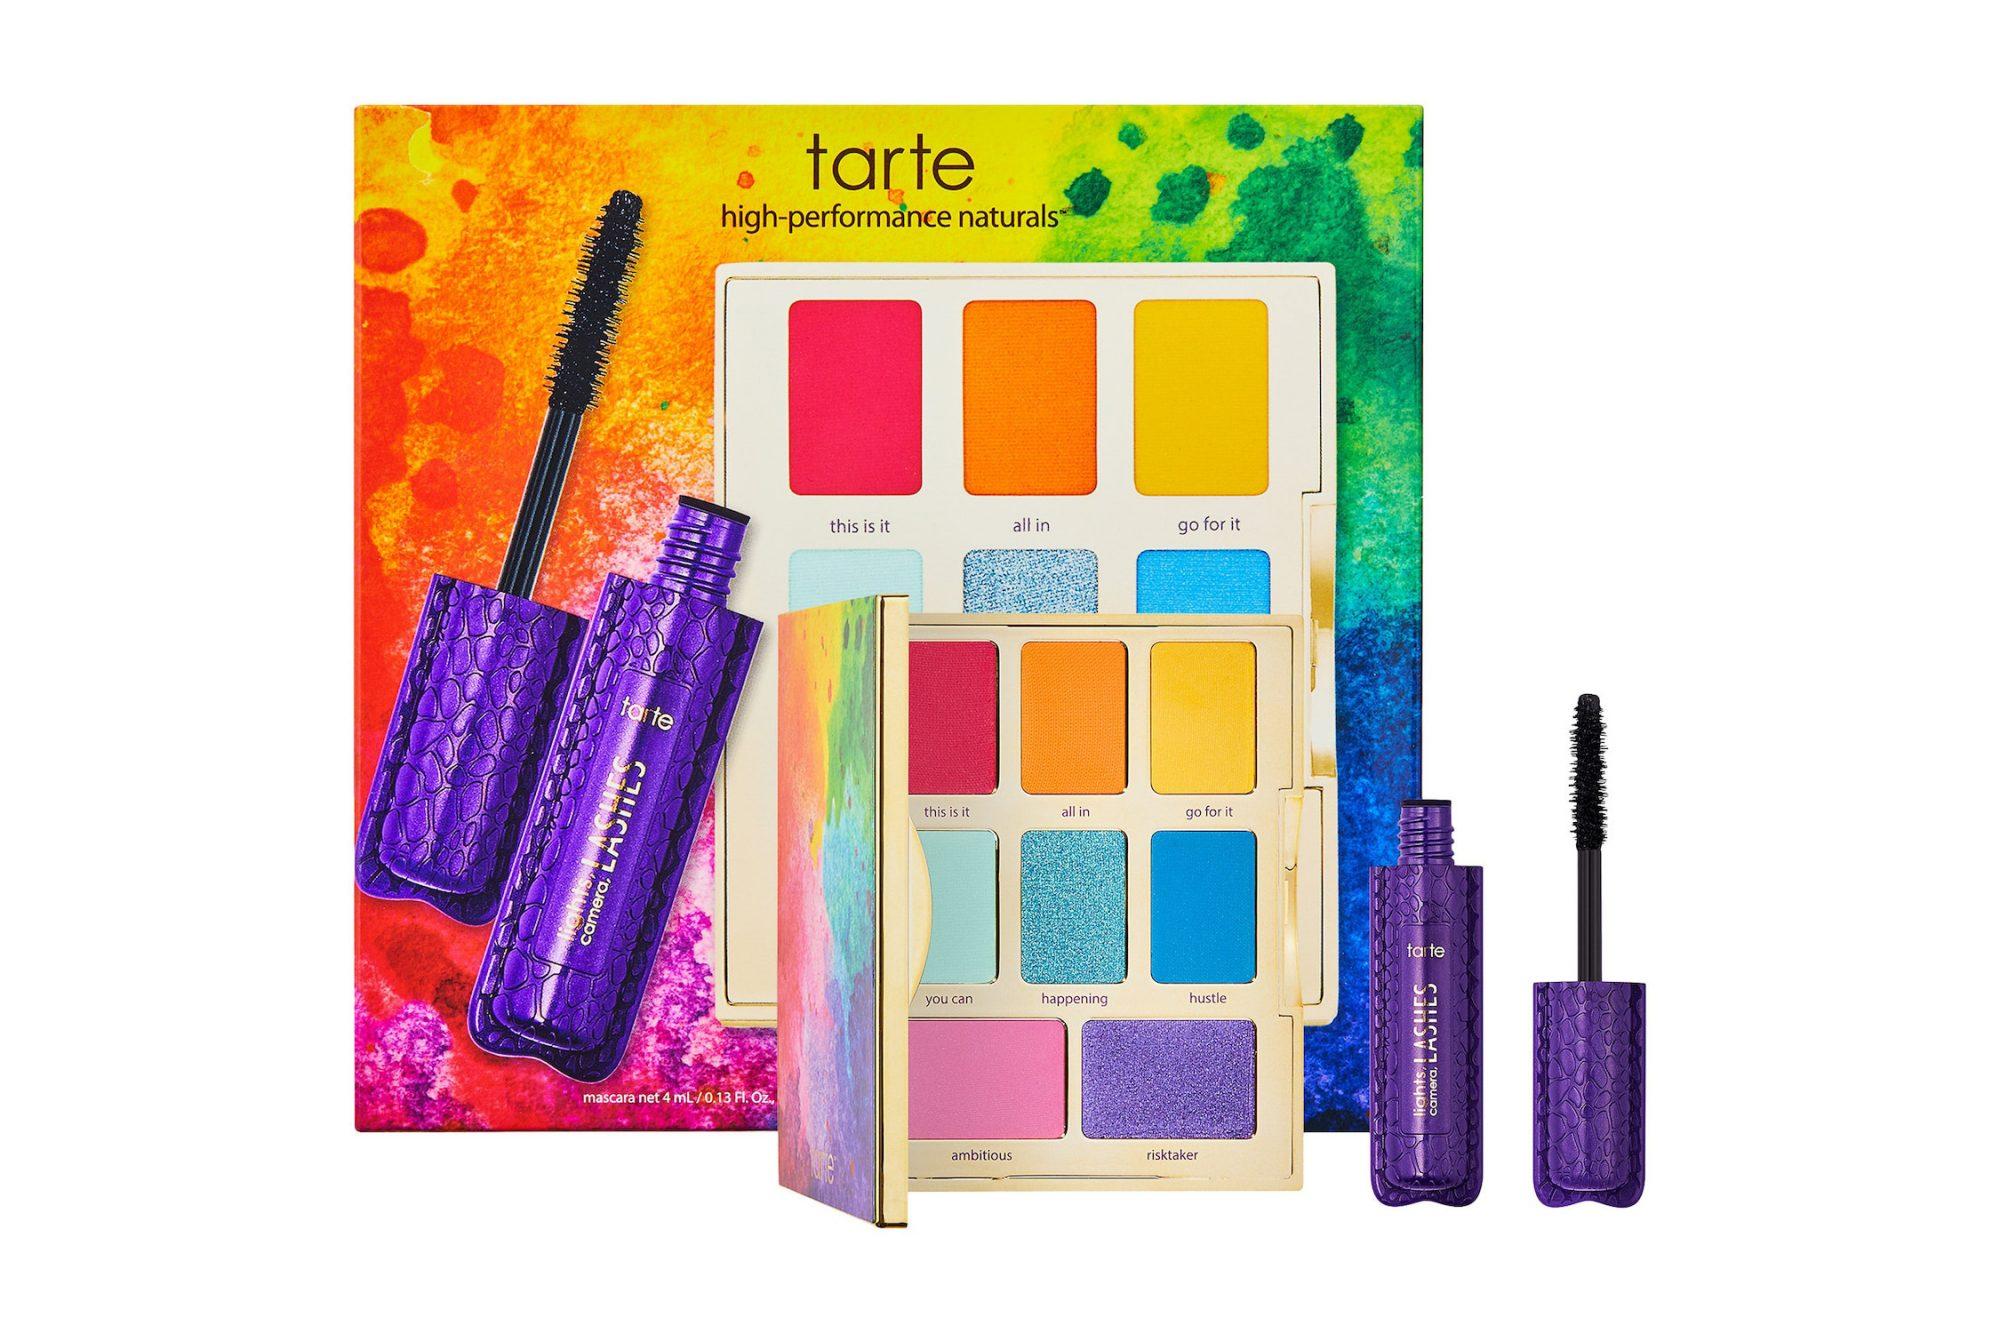 tarte pride palette